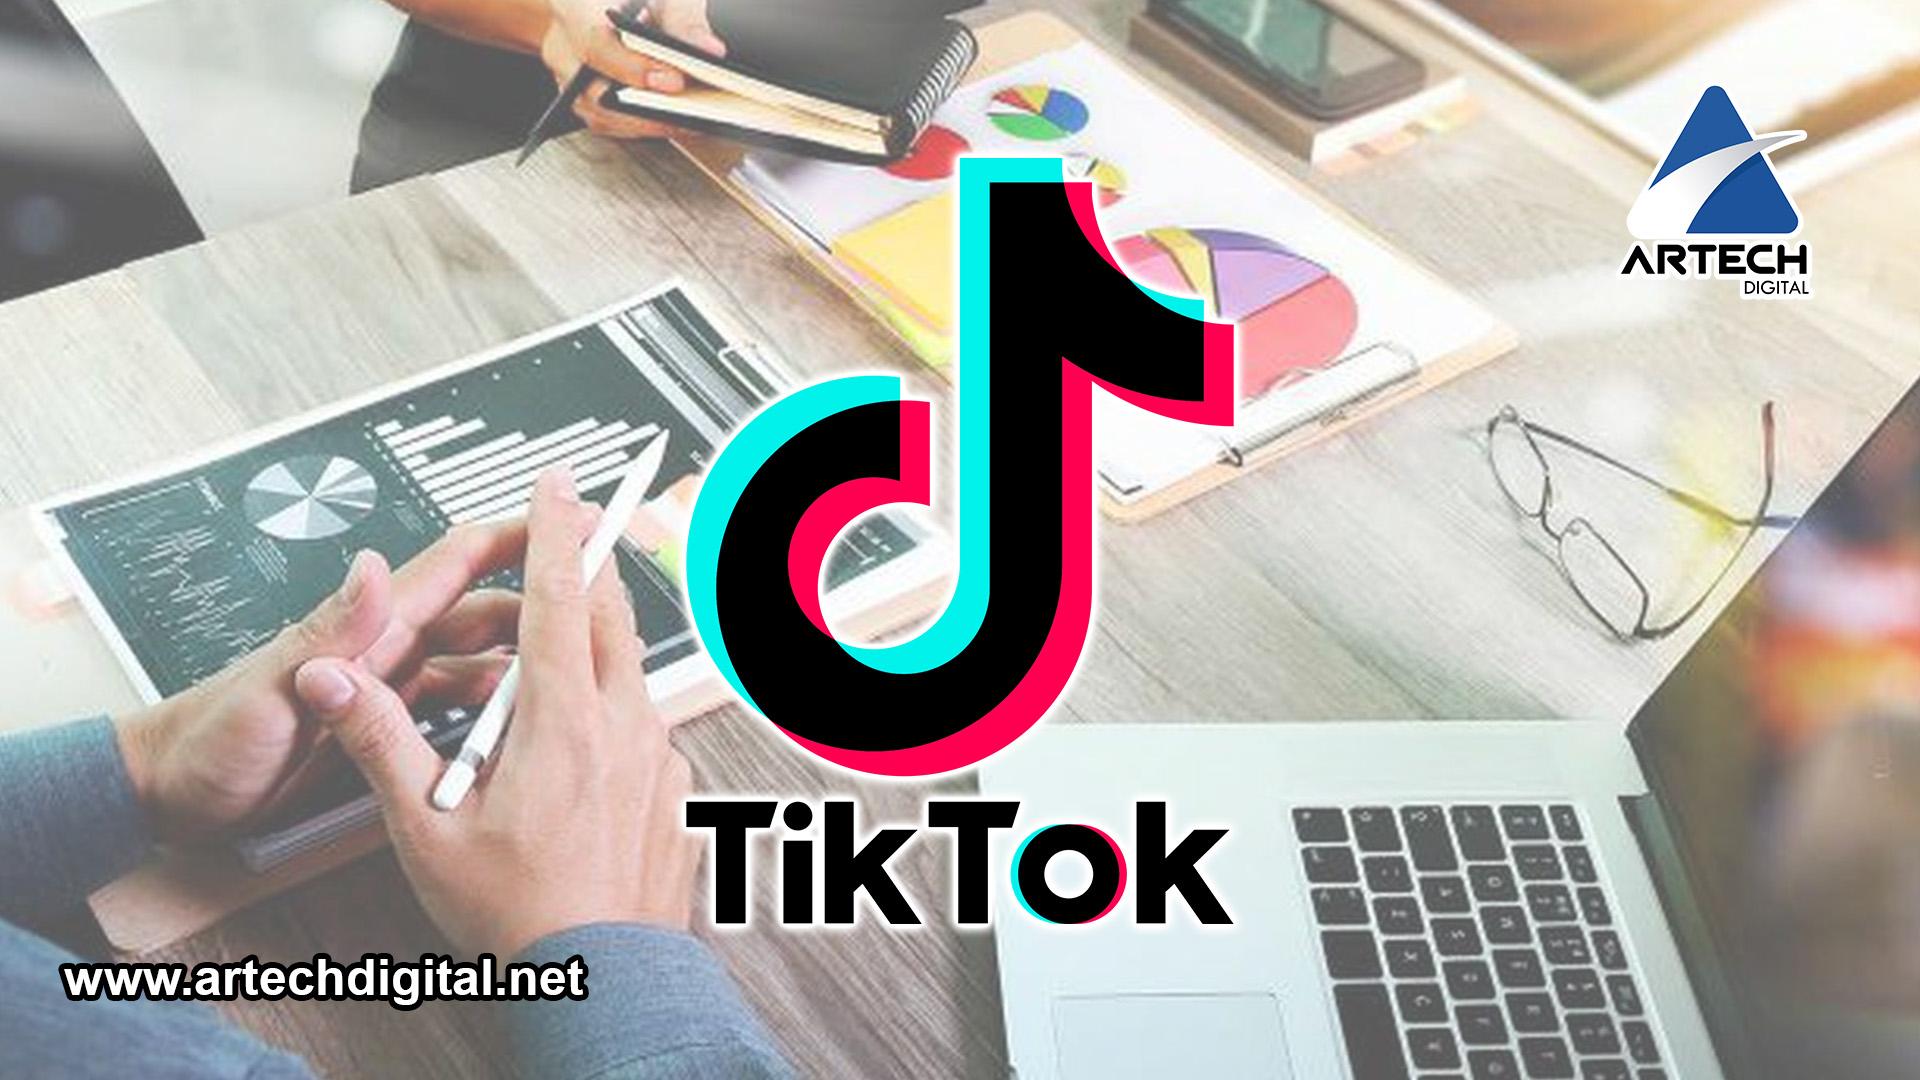 Marketing at TikTok - Artech 2